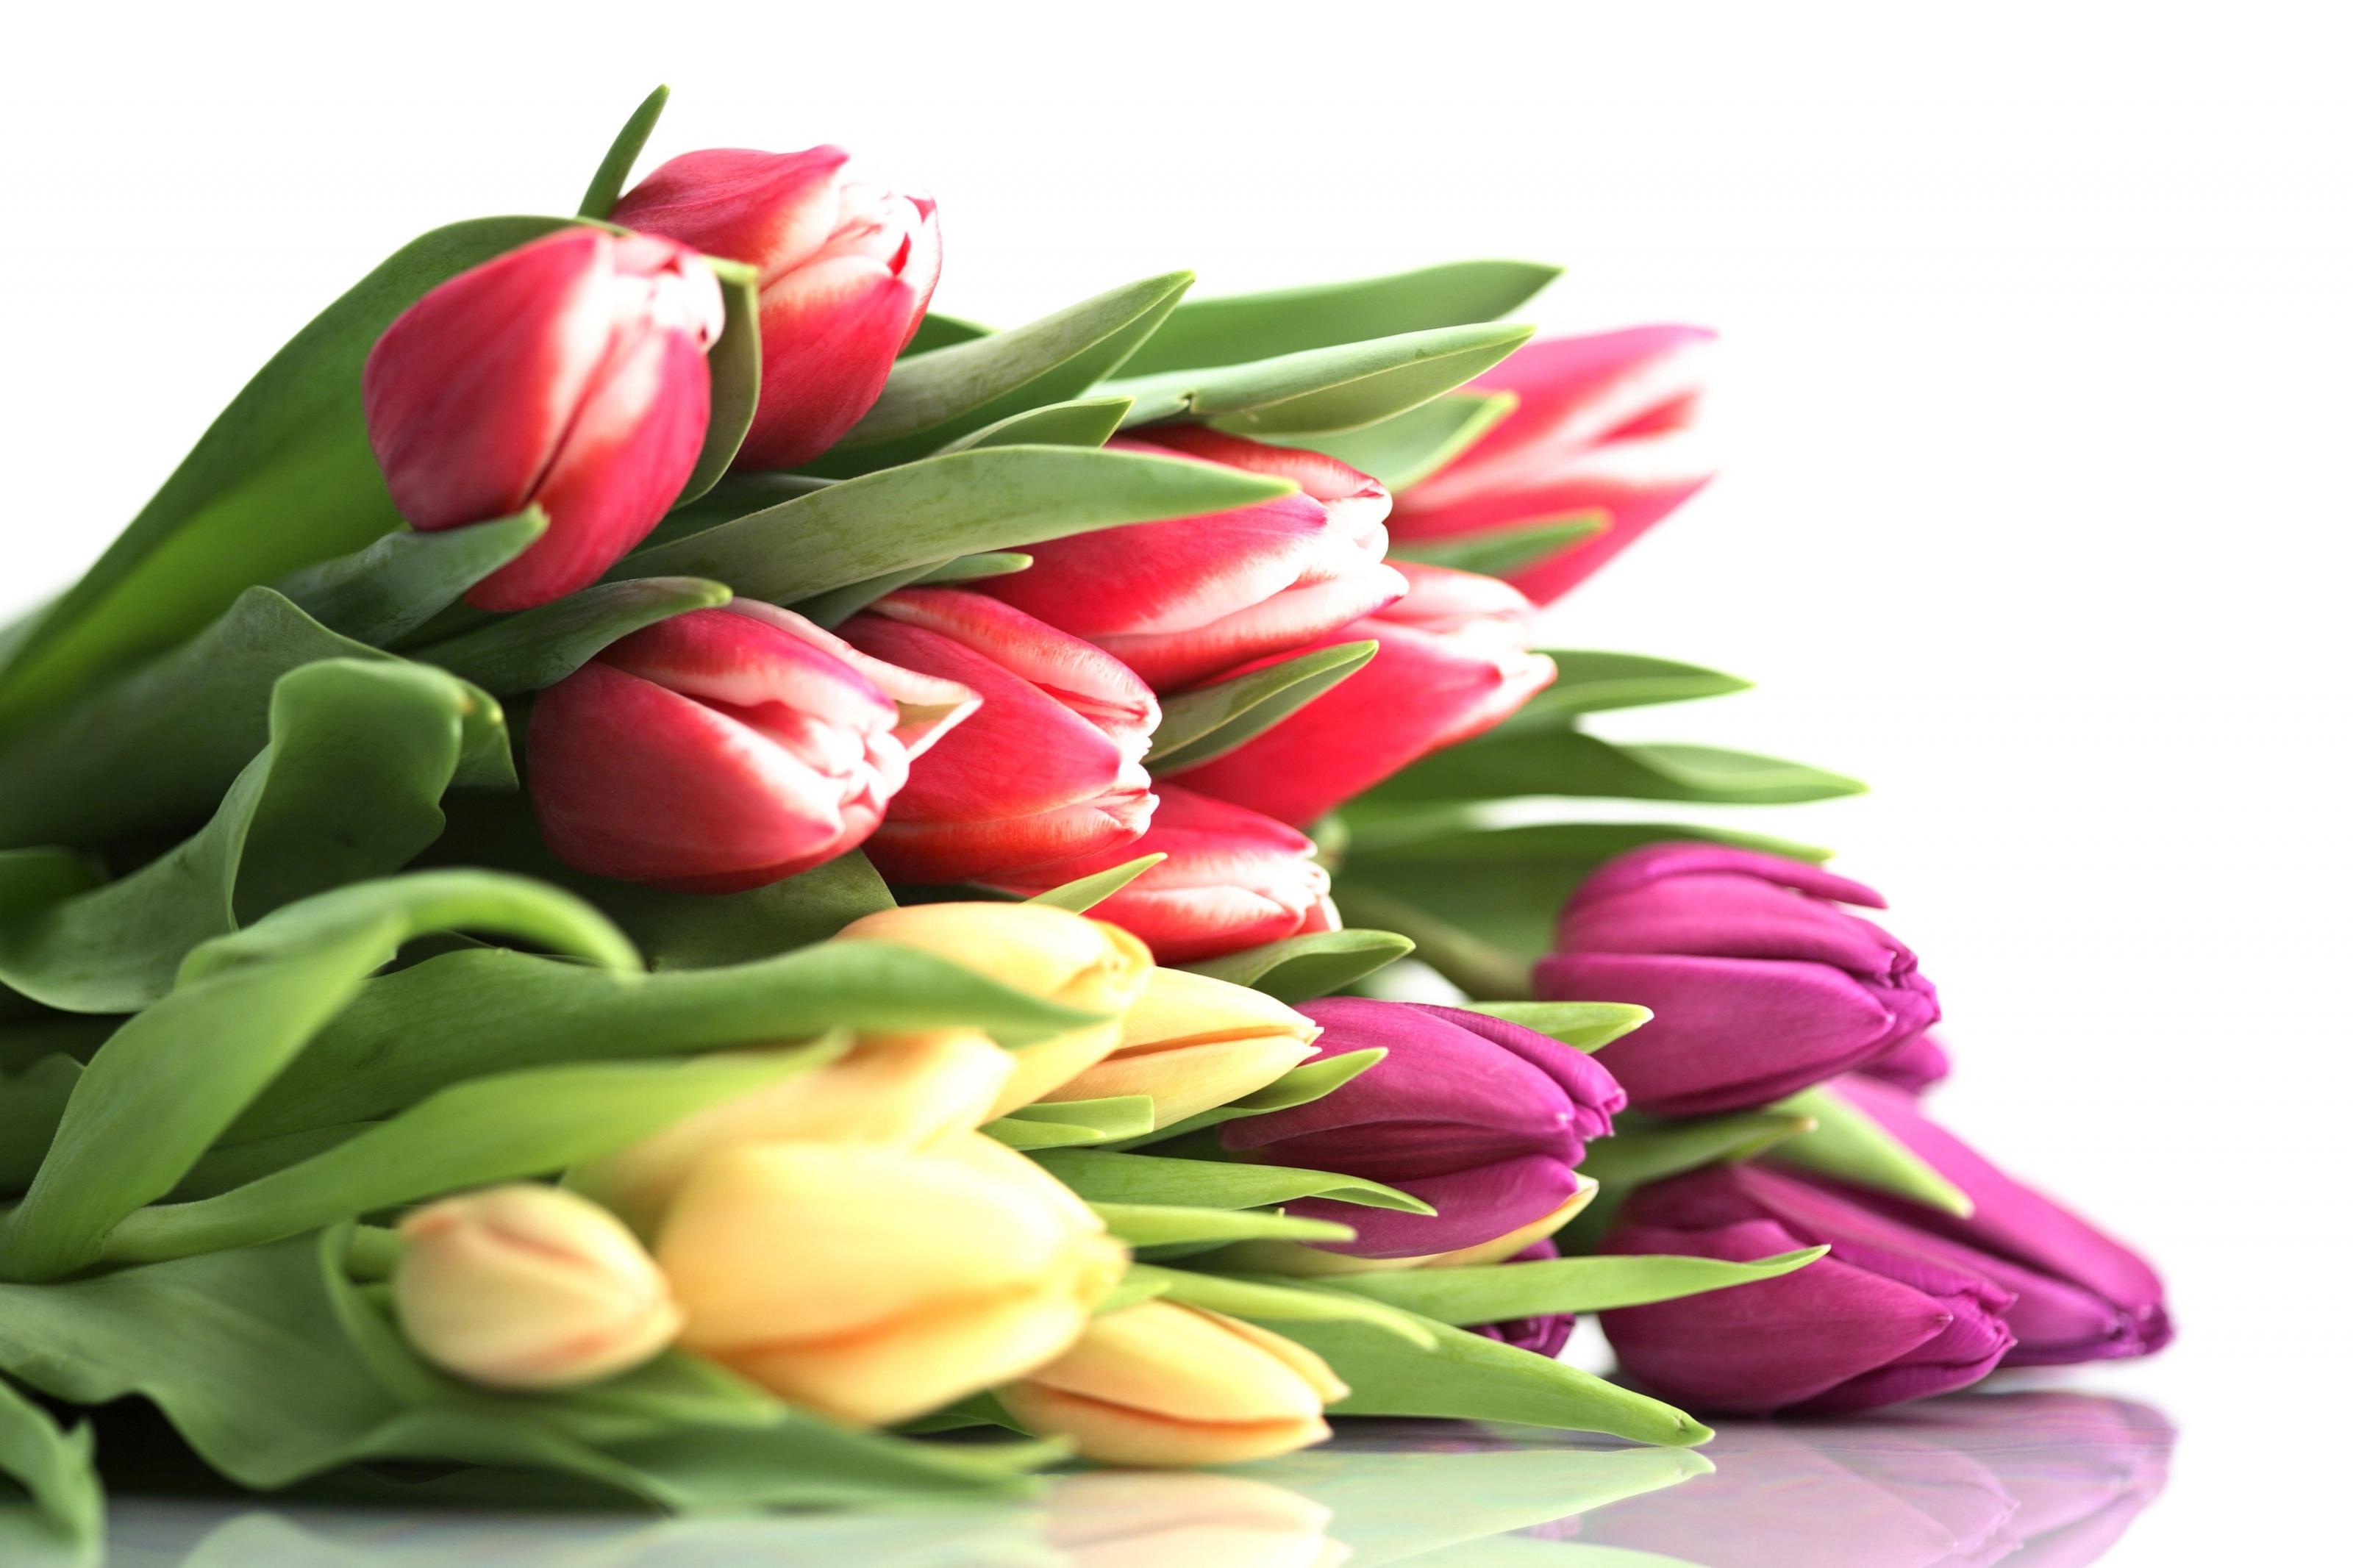 Подарки женщинам на 8 Марта в соответствии со знаком Зодиака